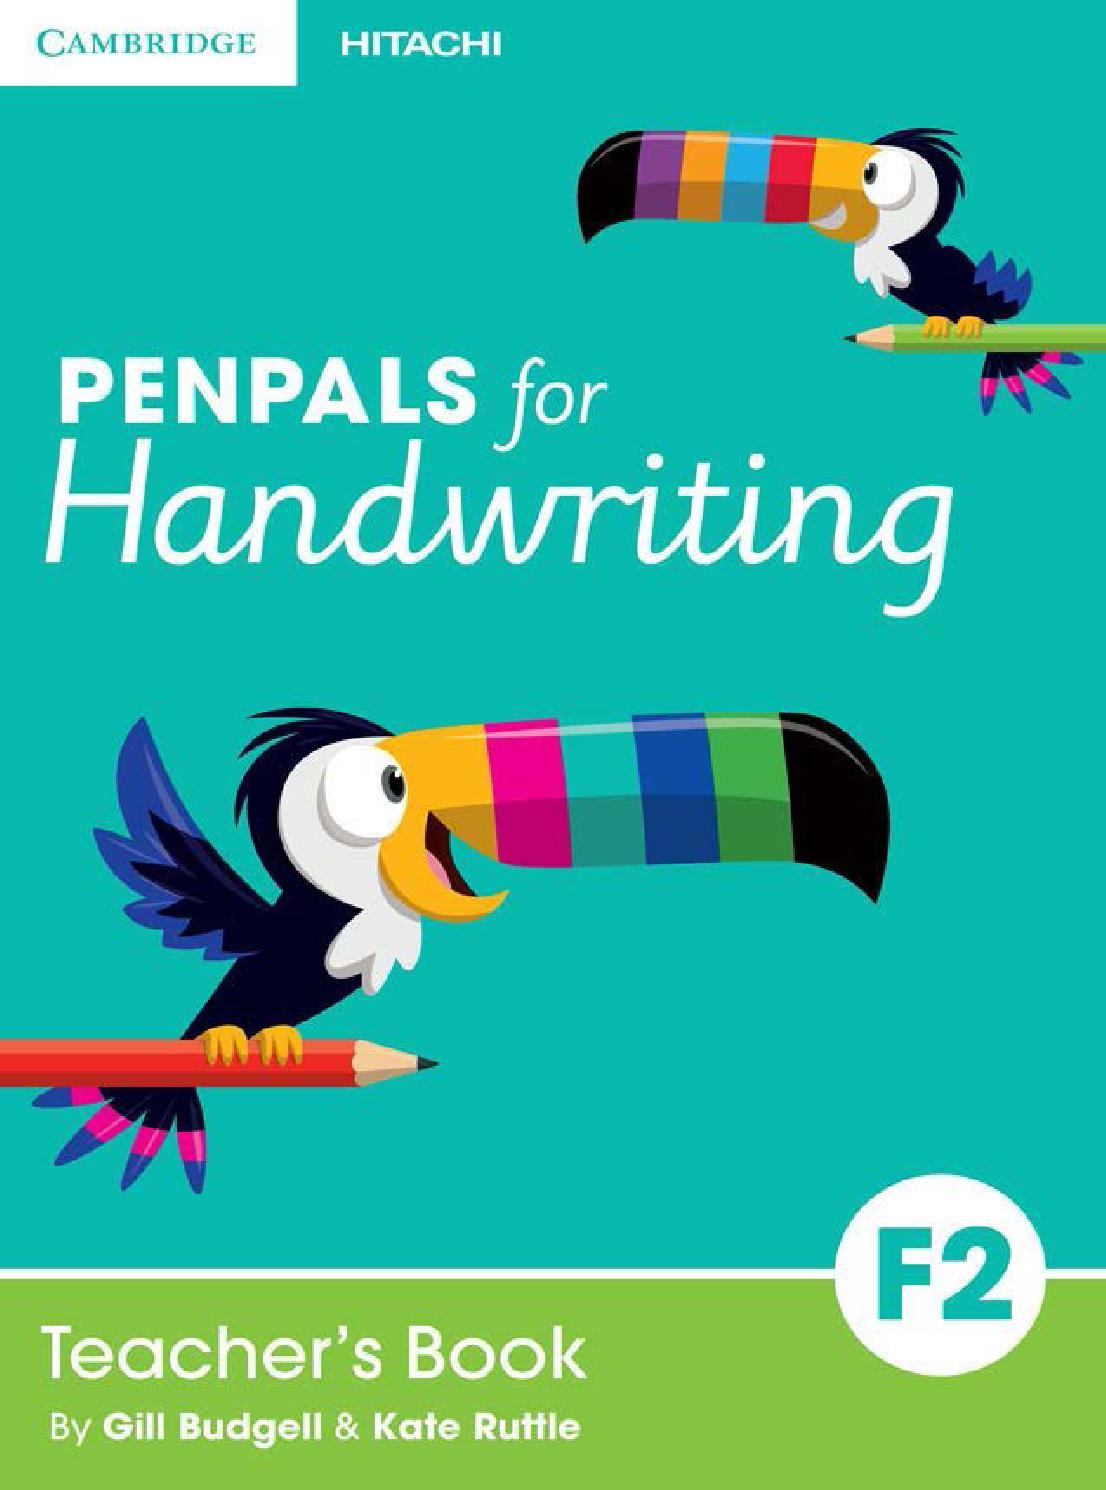 Penpals for Handwriting Teacher\'s Foundation Book 2 by Cambridge ...